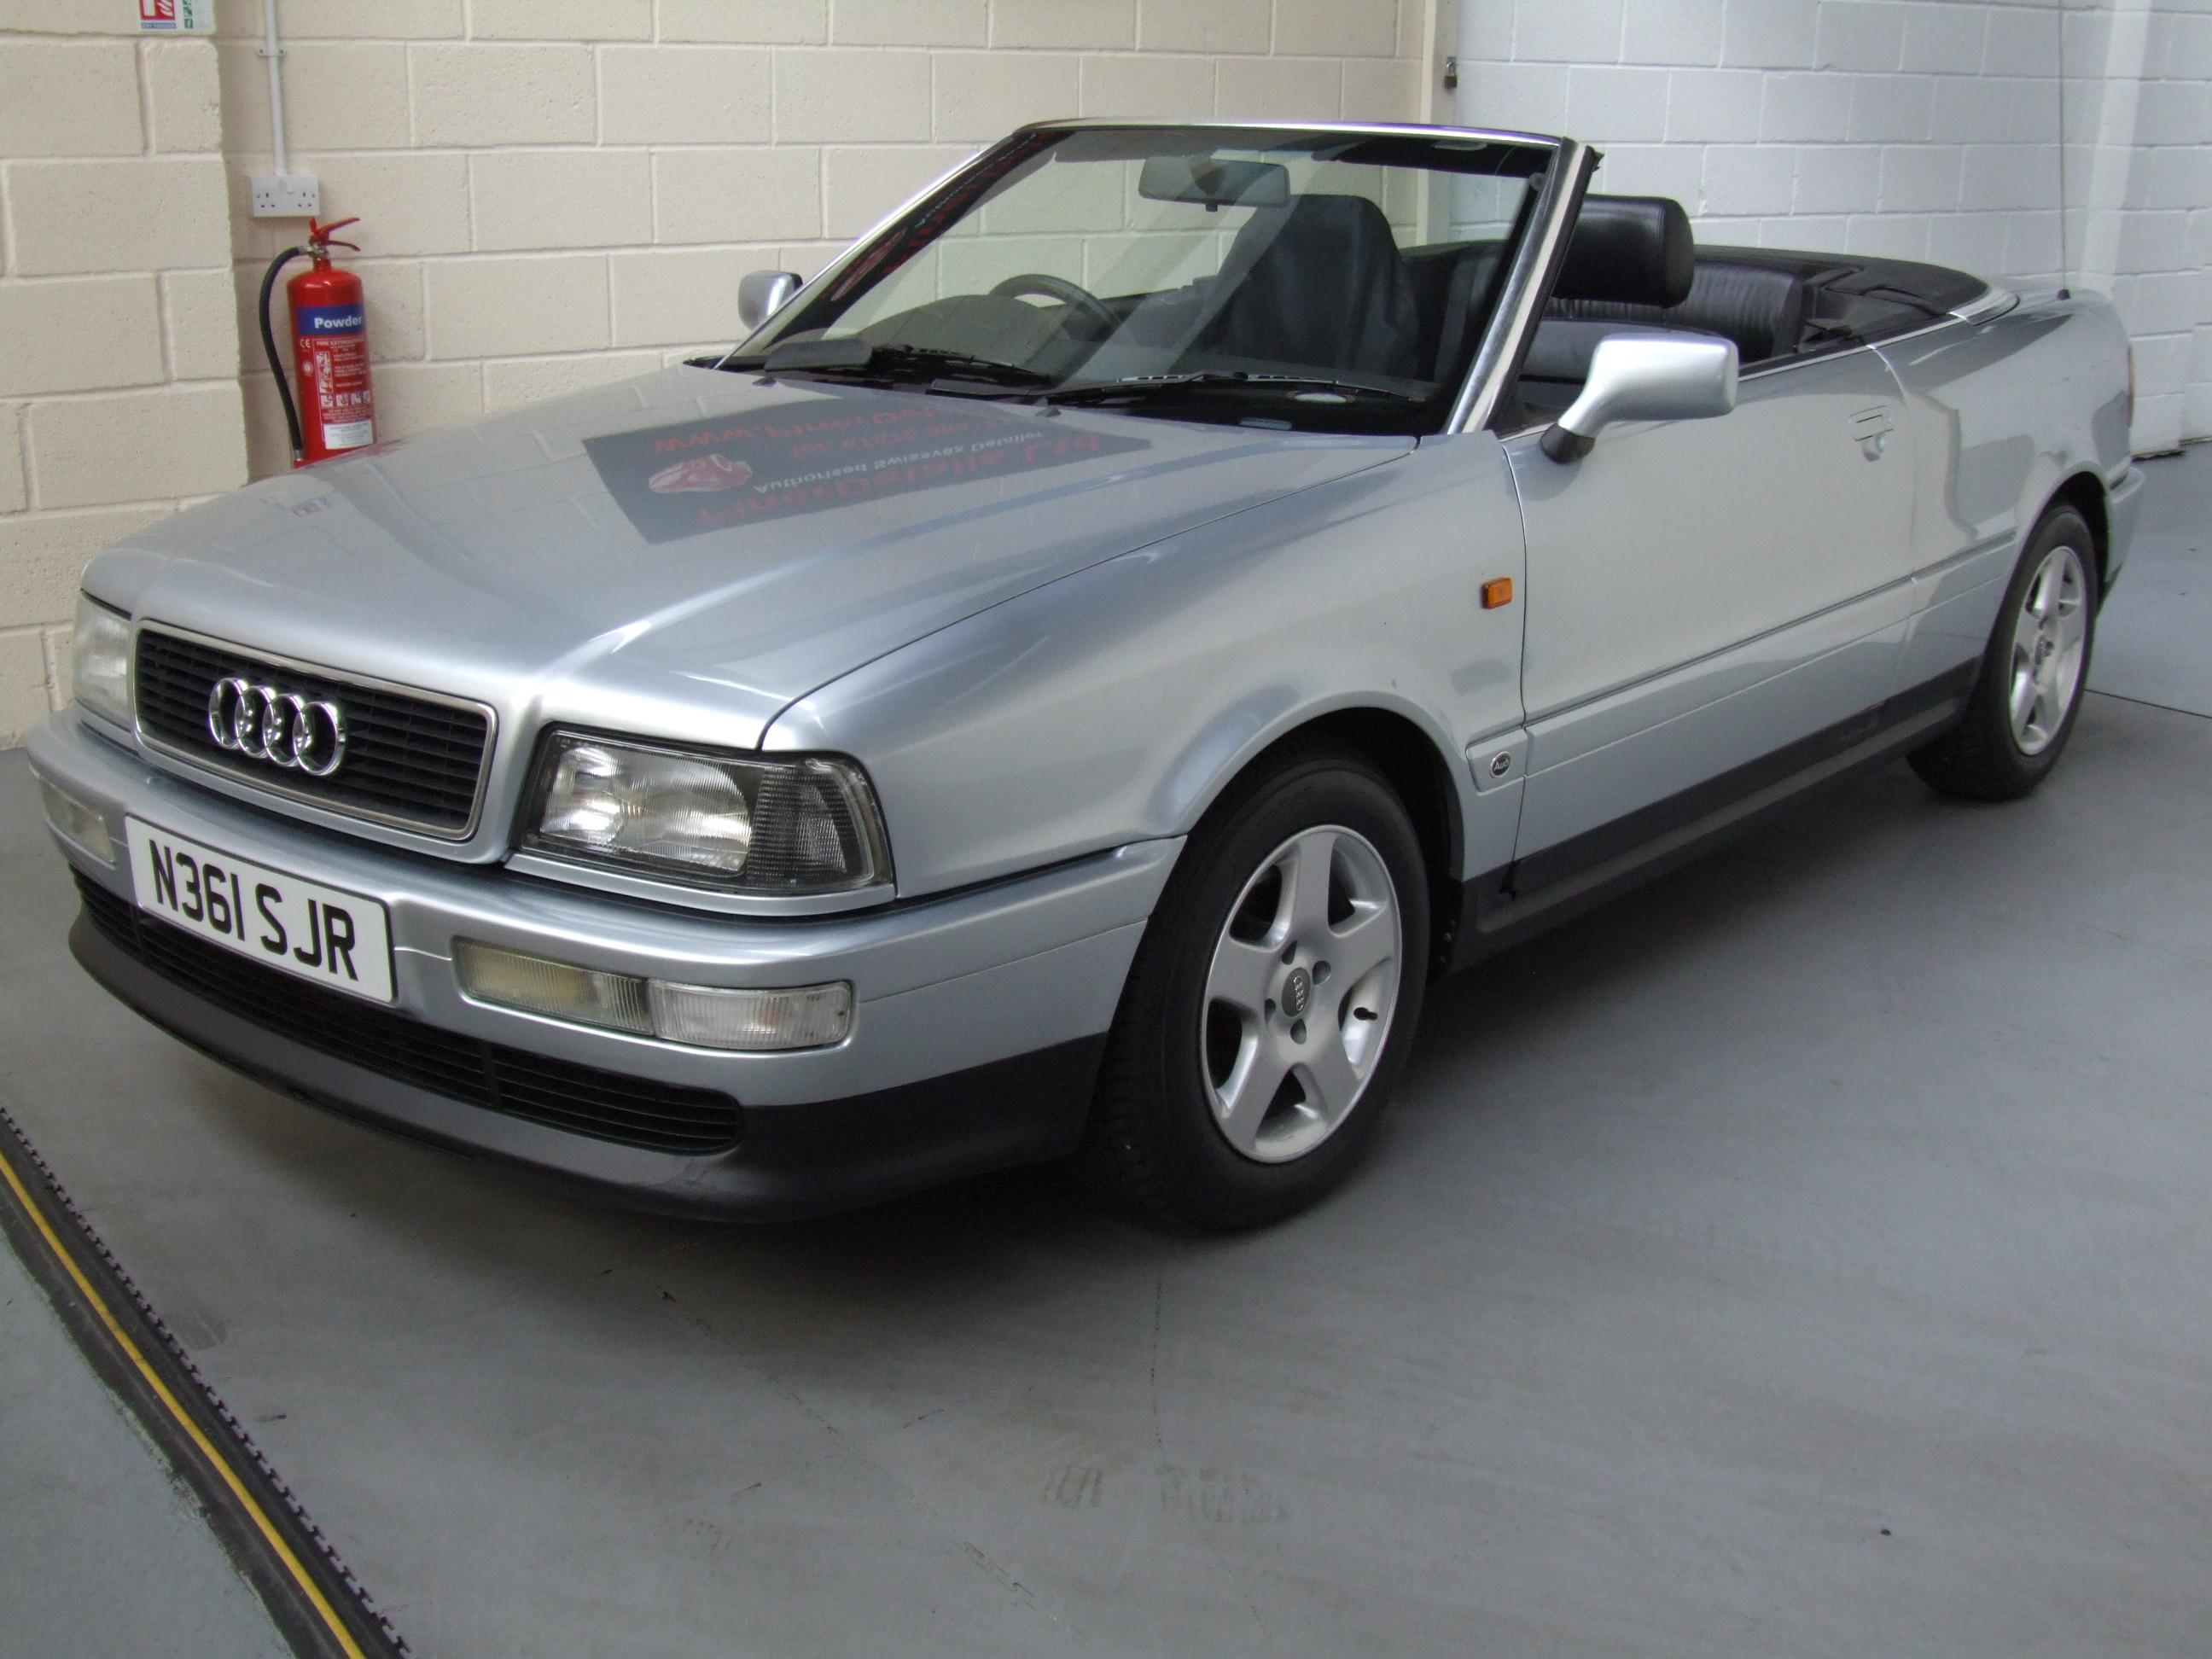 1996 Audi Cabriolet Image 6